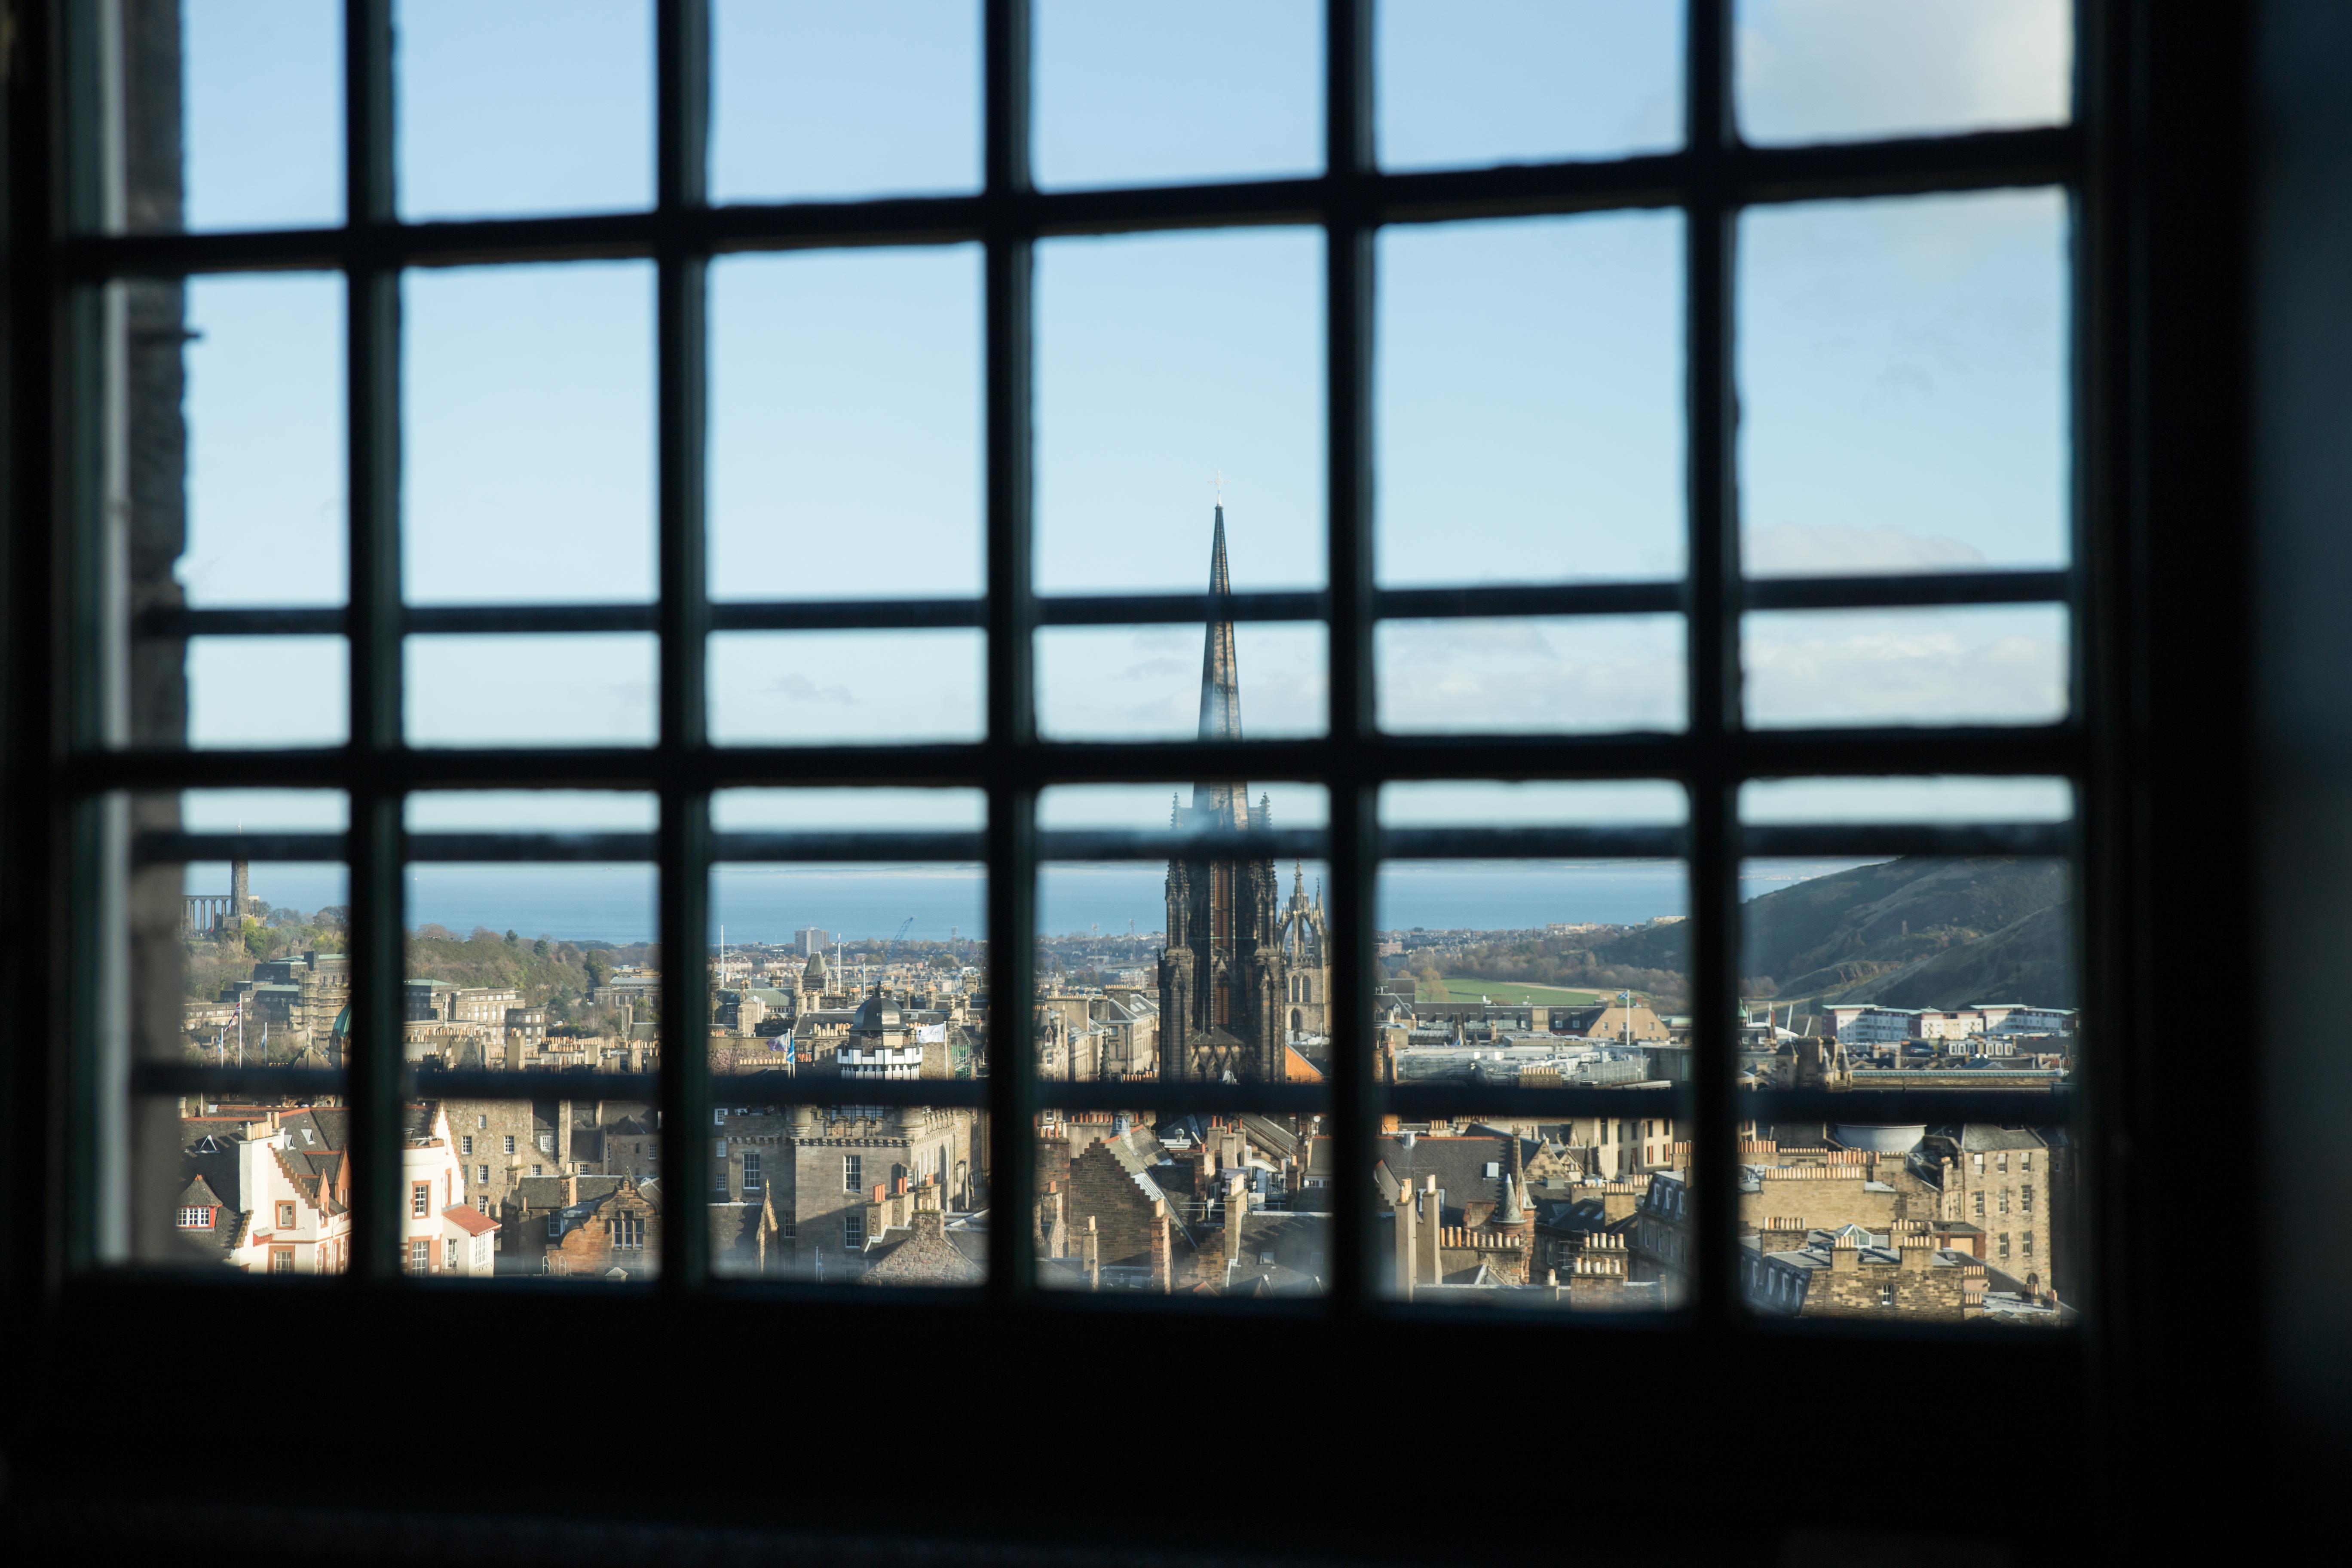 Where to Find the Best Views in Edinburgh